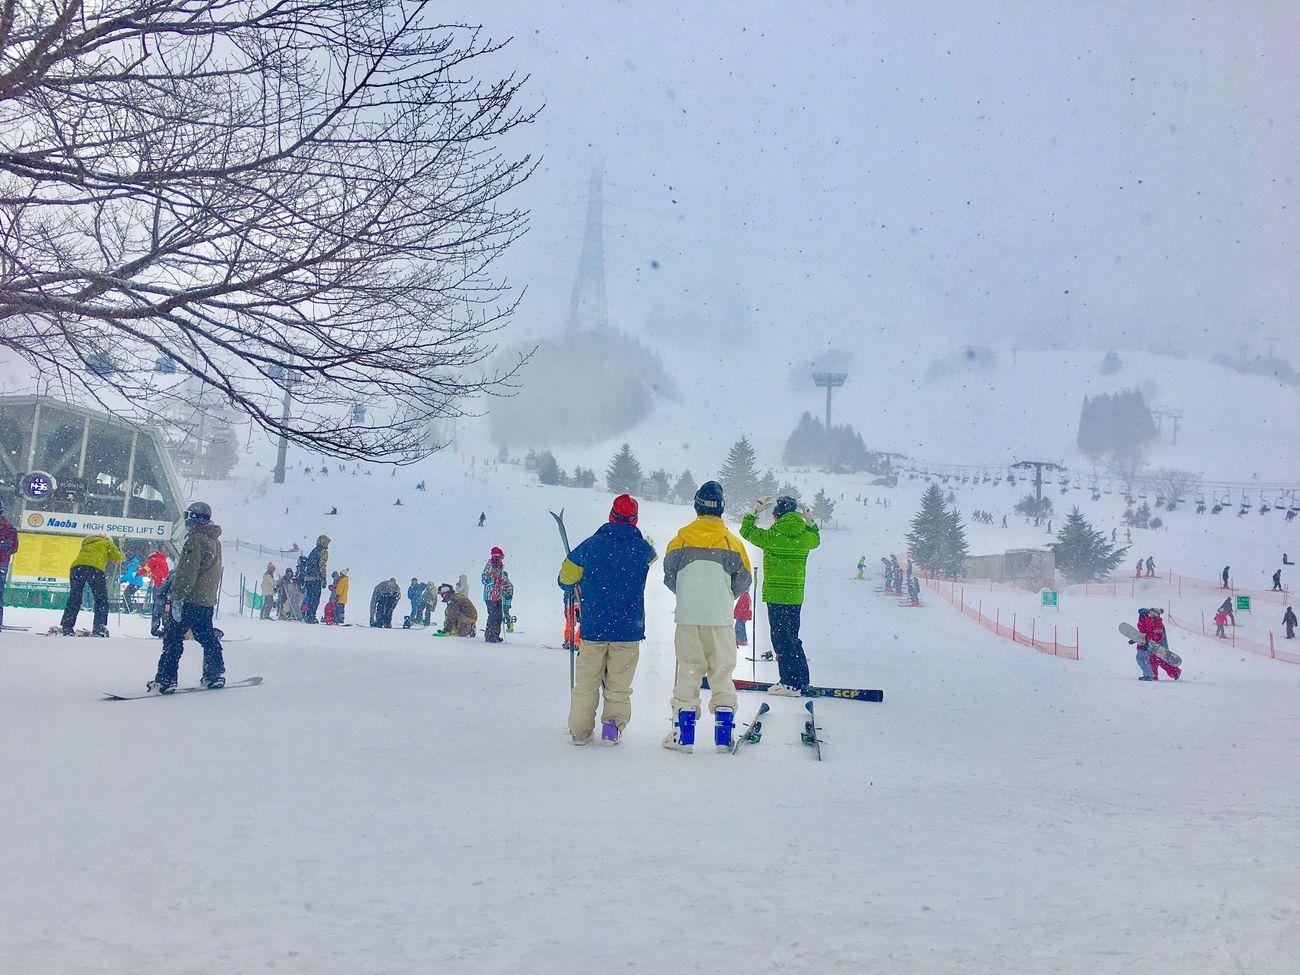 Snow Snow ❄ Snowing Niigata Naeba Skiing Resort Snowboard Snowboarding Japan Wintersports